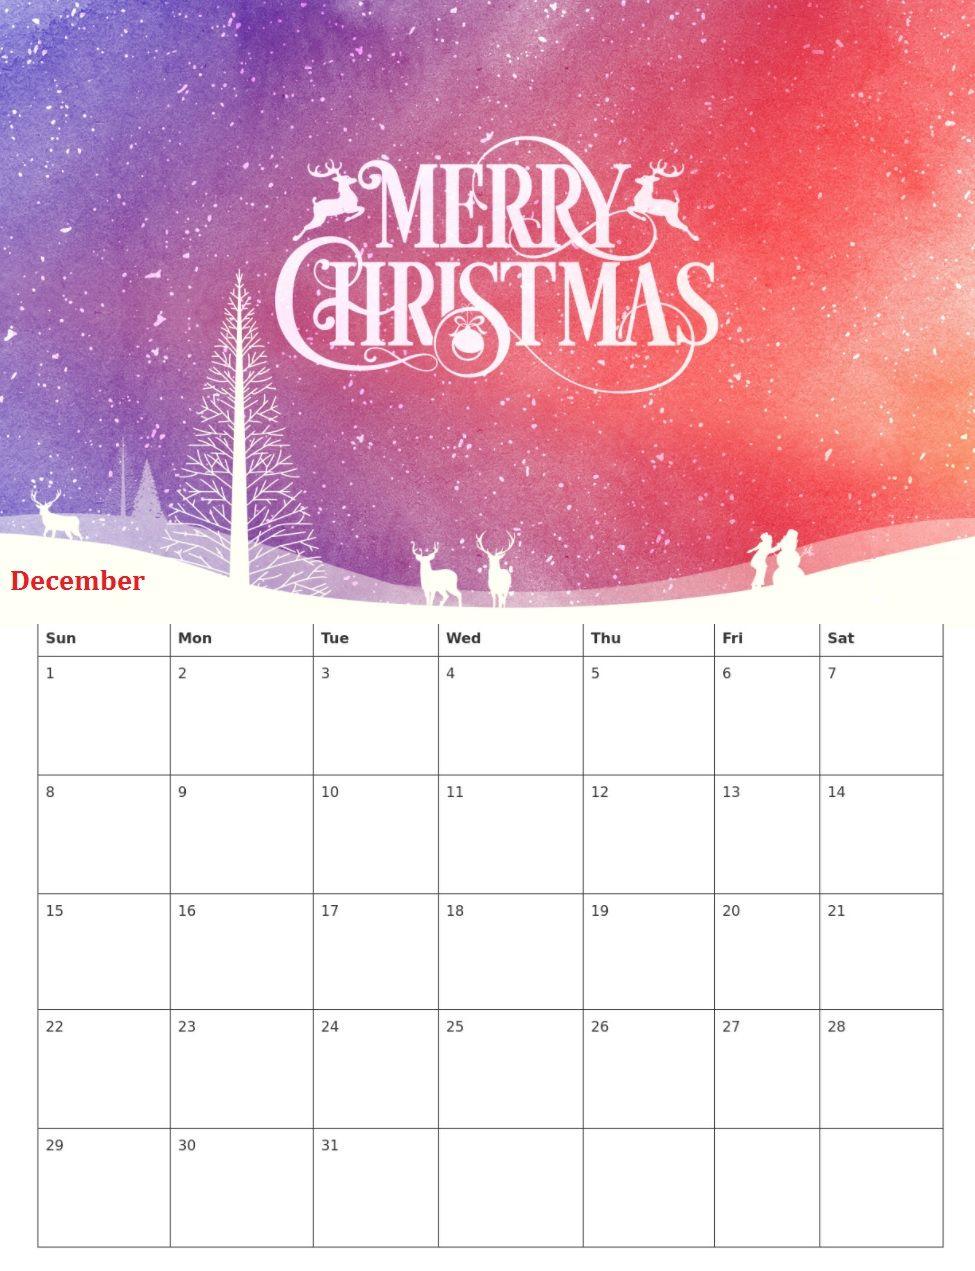 Cute December 2019 Christmas Calendar | Christmas Calendar